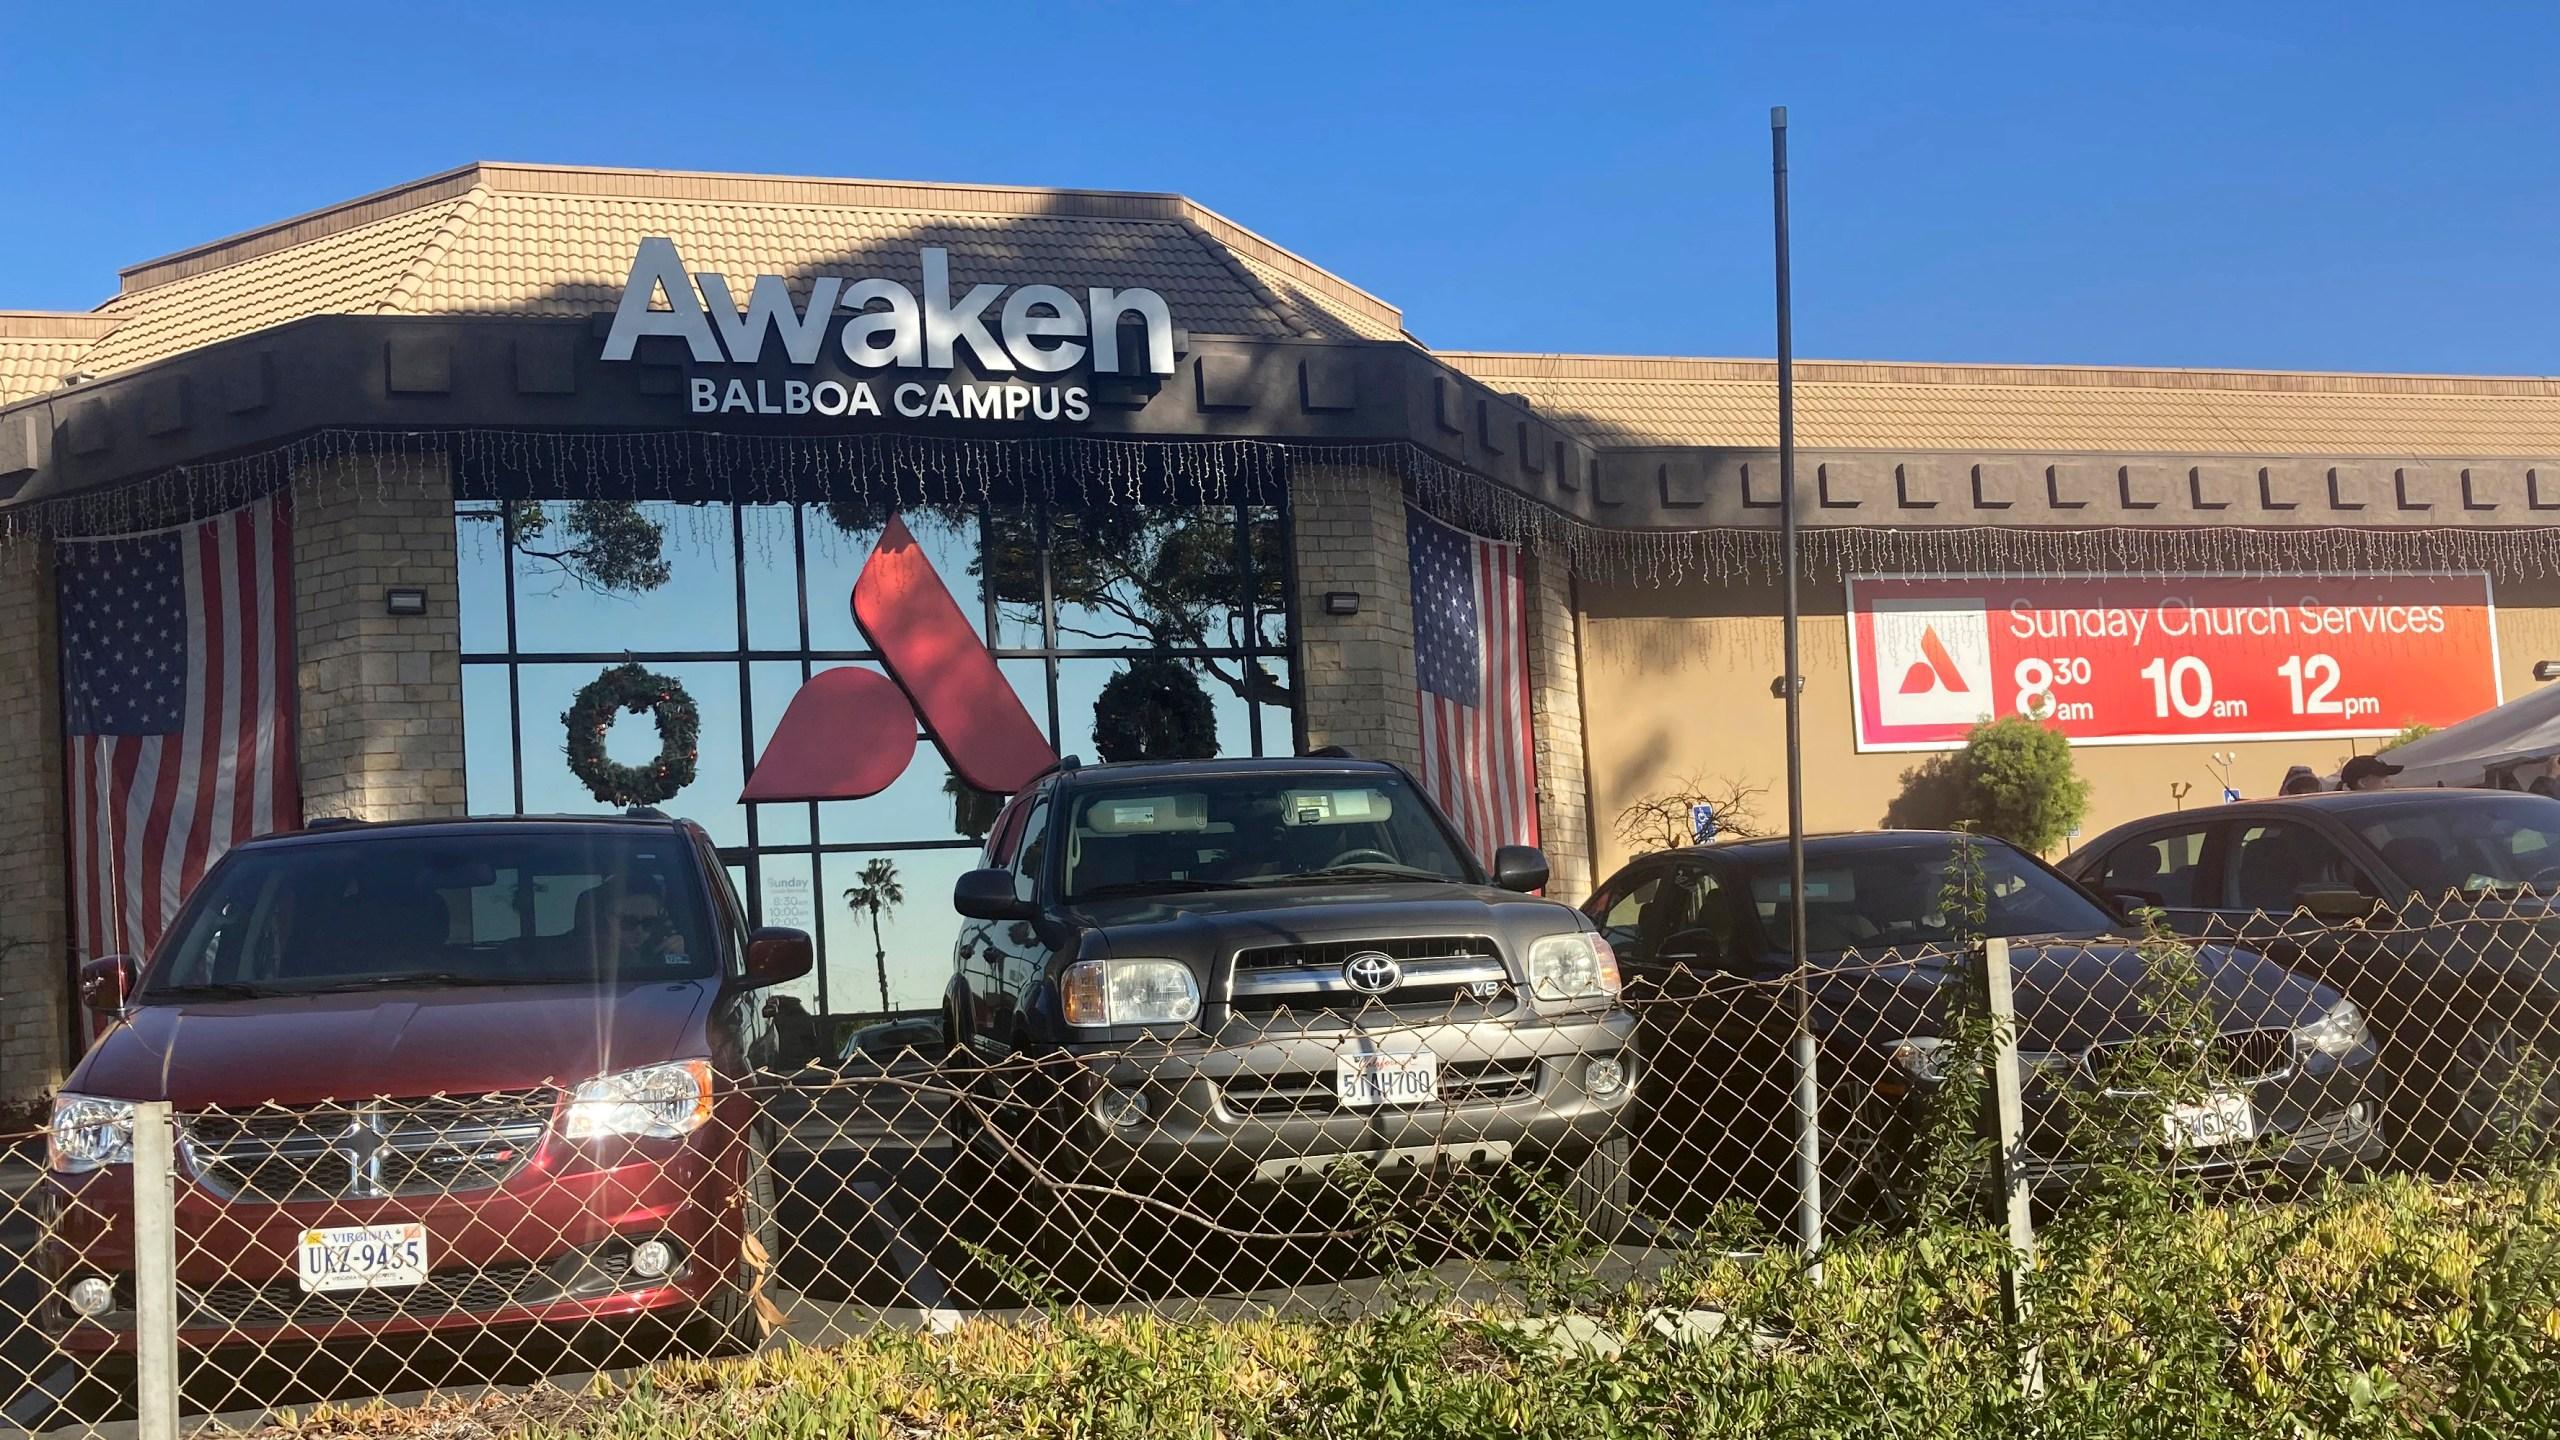 Awaken Church is seen on Dec. 3, 2020, in San Diego. (AP Photo/Elliot Spagat)